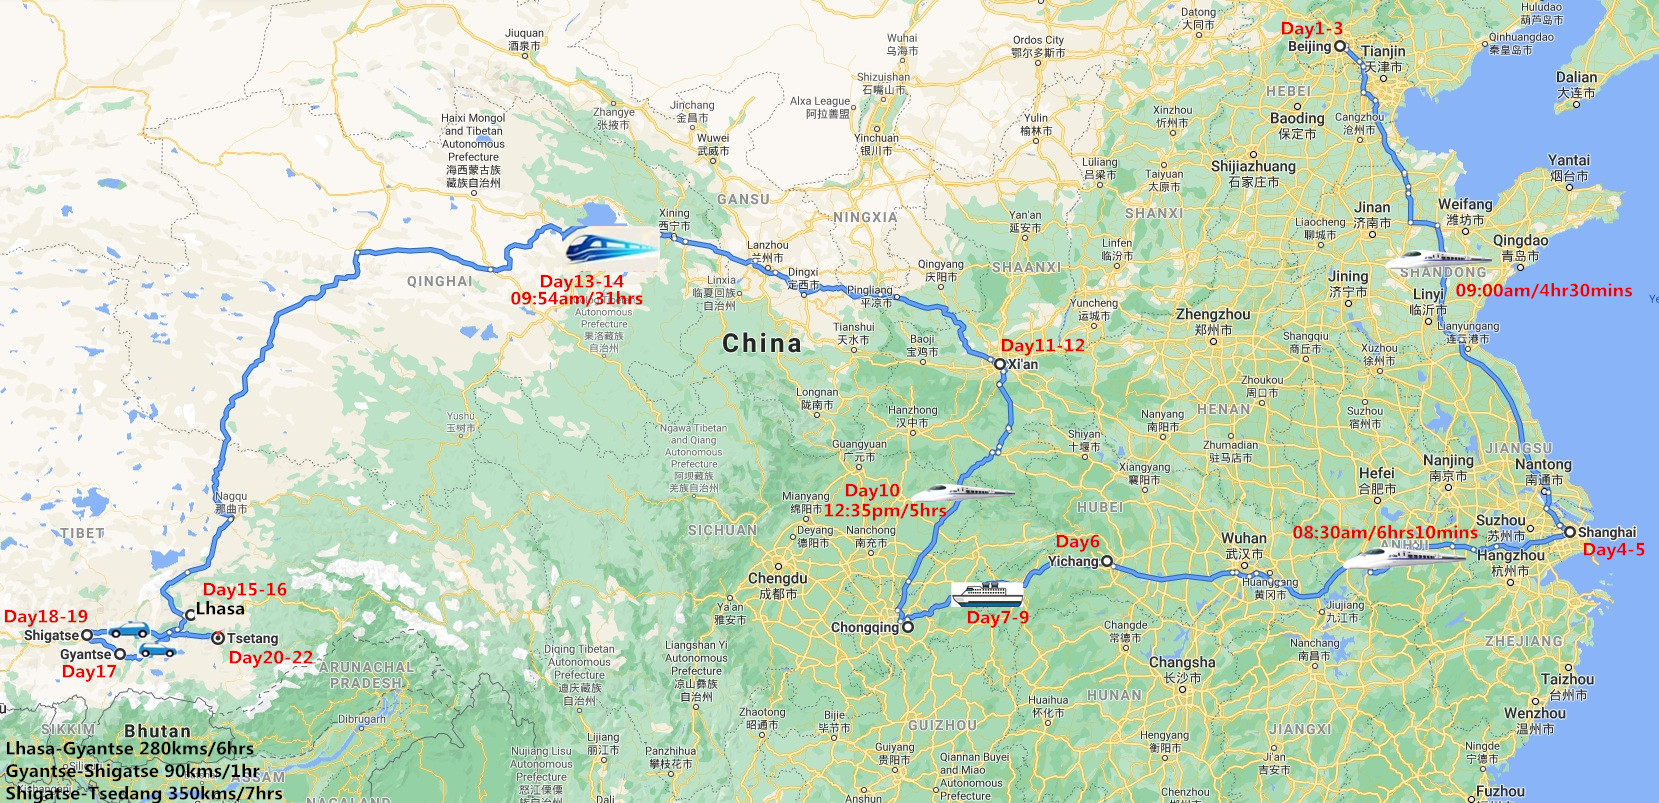 22 Days China Adventure Tour with Yangtze River Cruise Travel Map